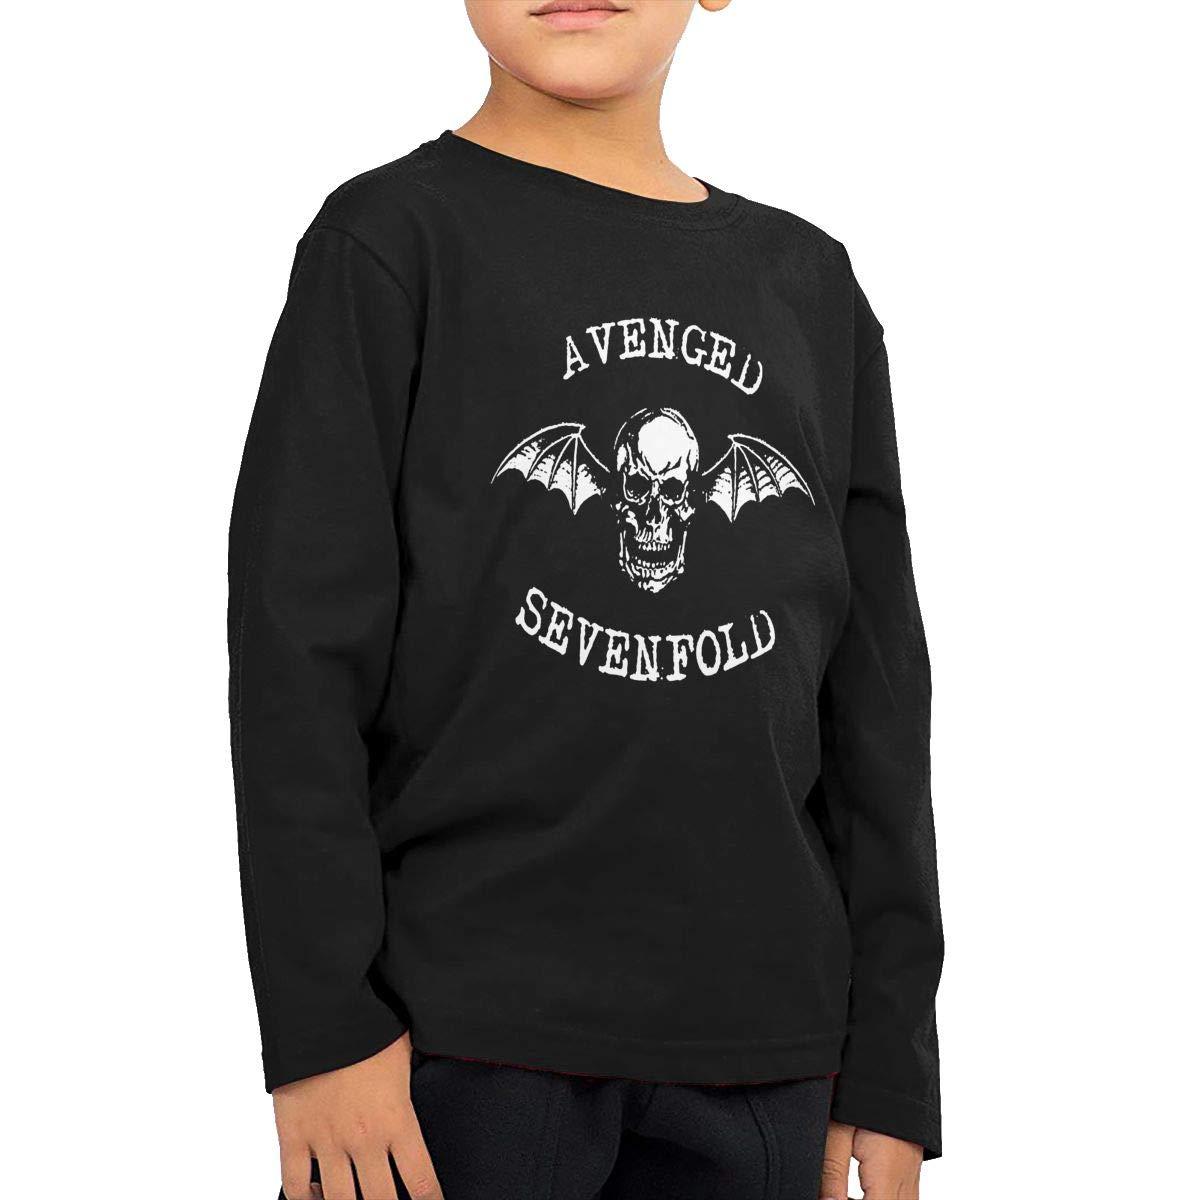 Fional Fashion Printing Children S T Shirt Avenged Sevenfold Long Short Sleeve